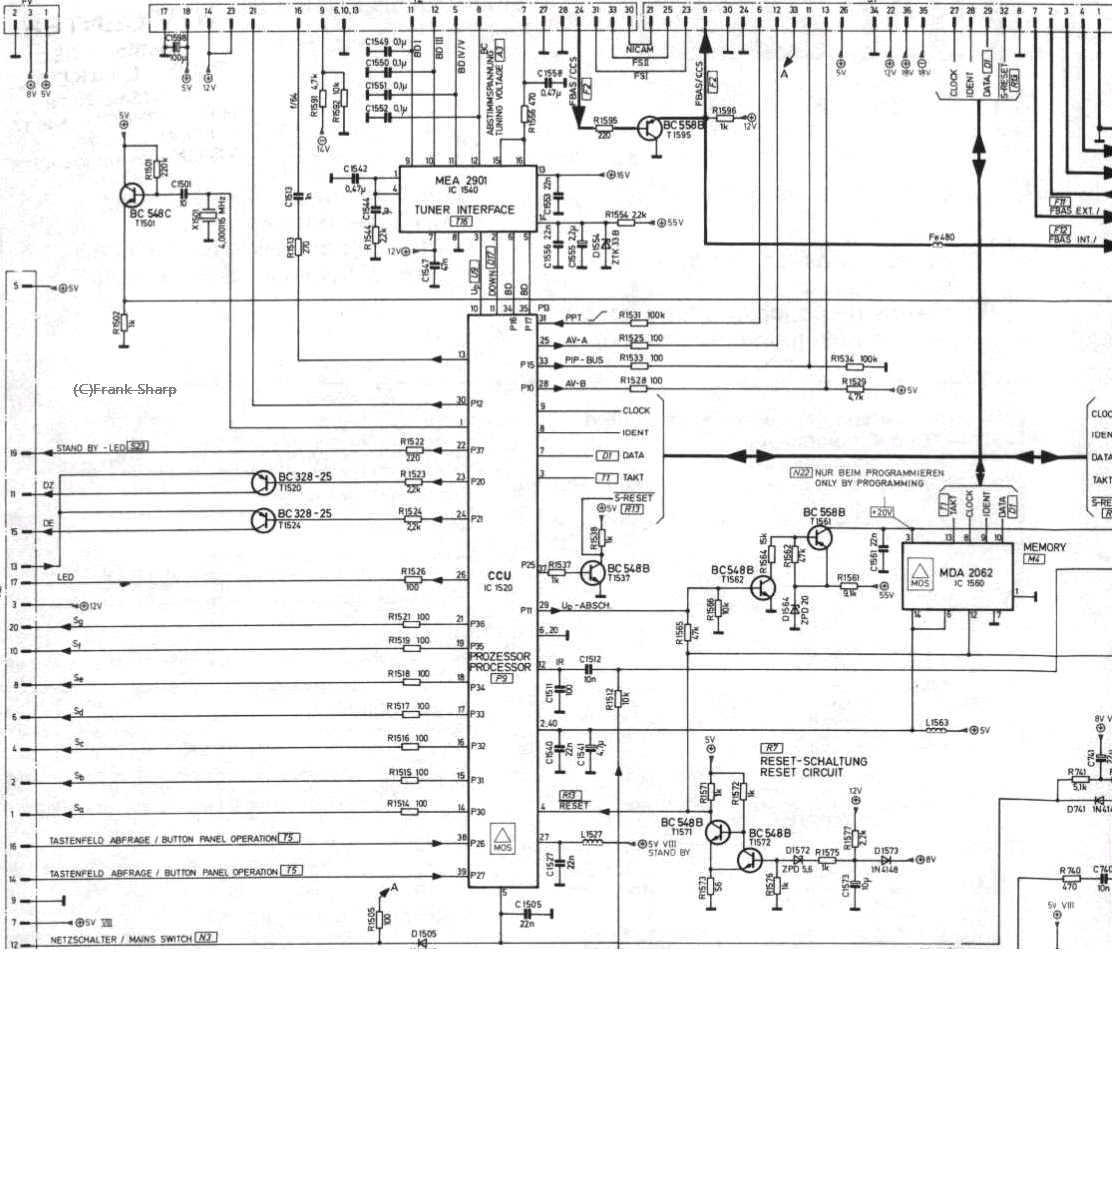 small resolution of edenpure model 500 wiring diagram heat map diagram wiring edenpure heater model 1000 edenpure heater on sale